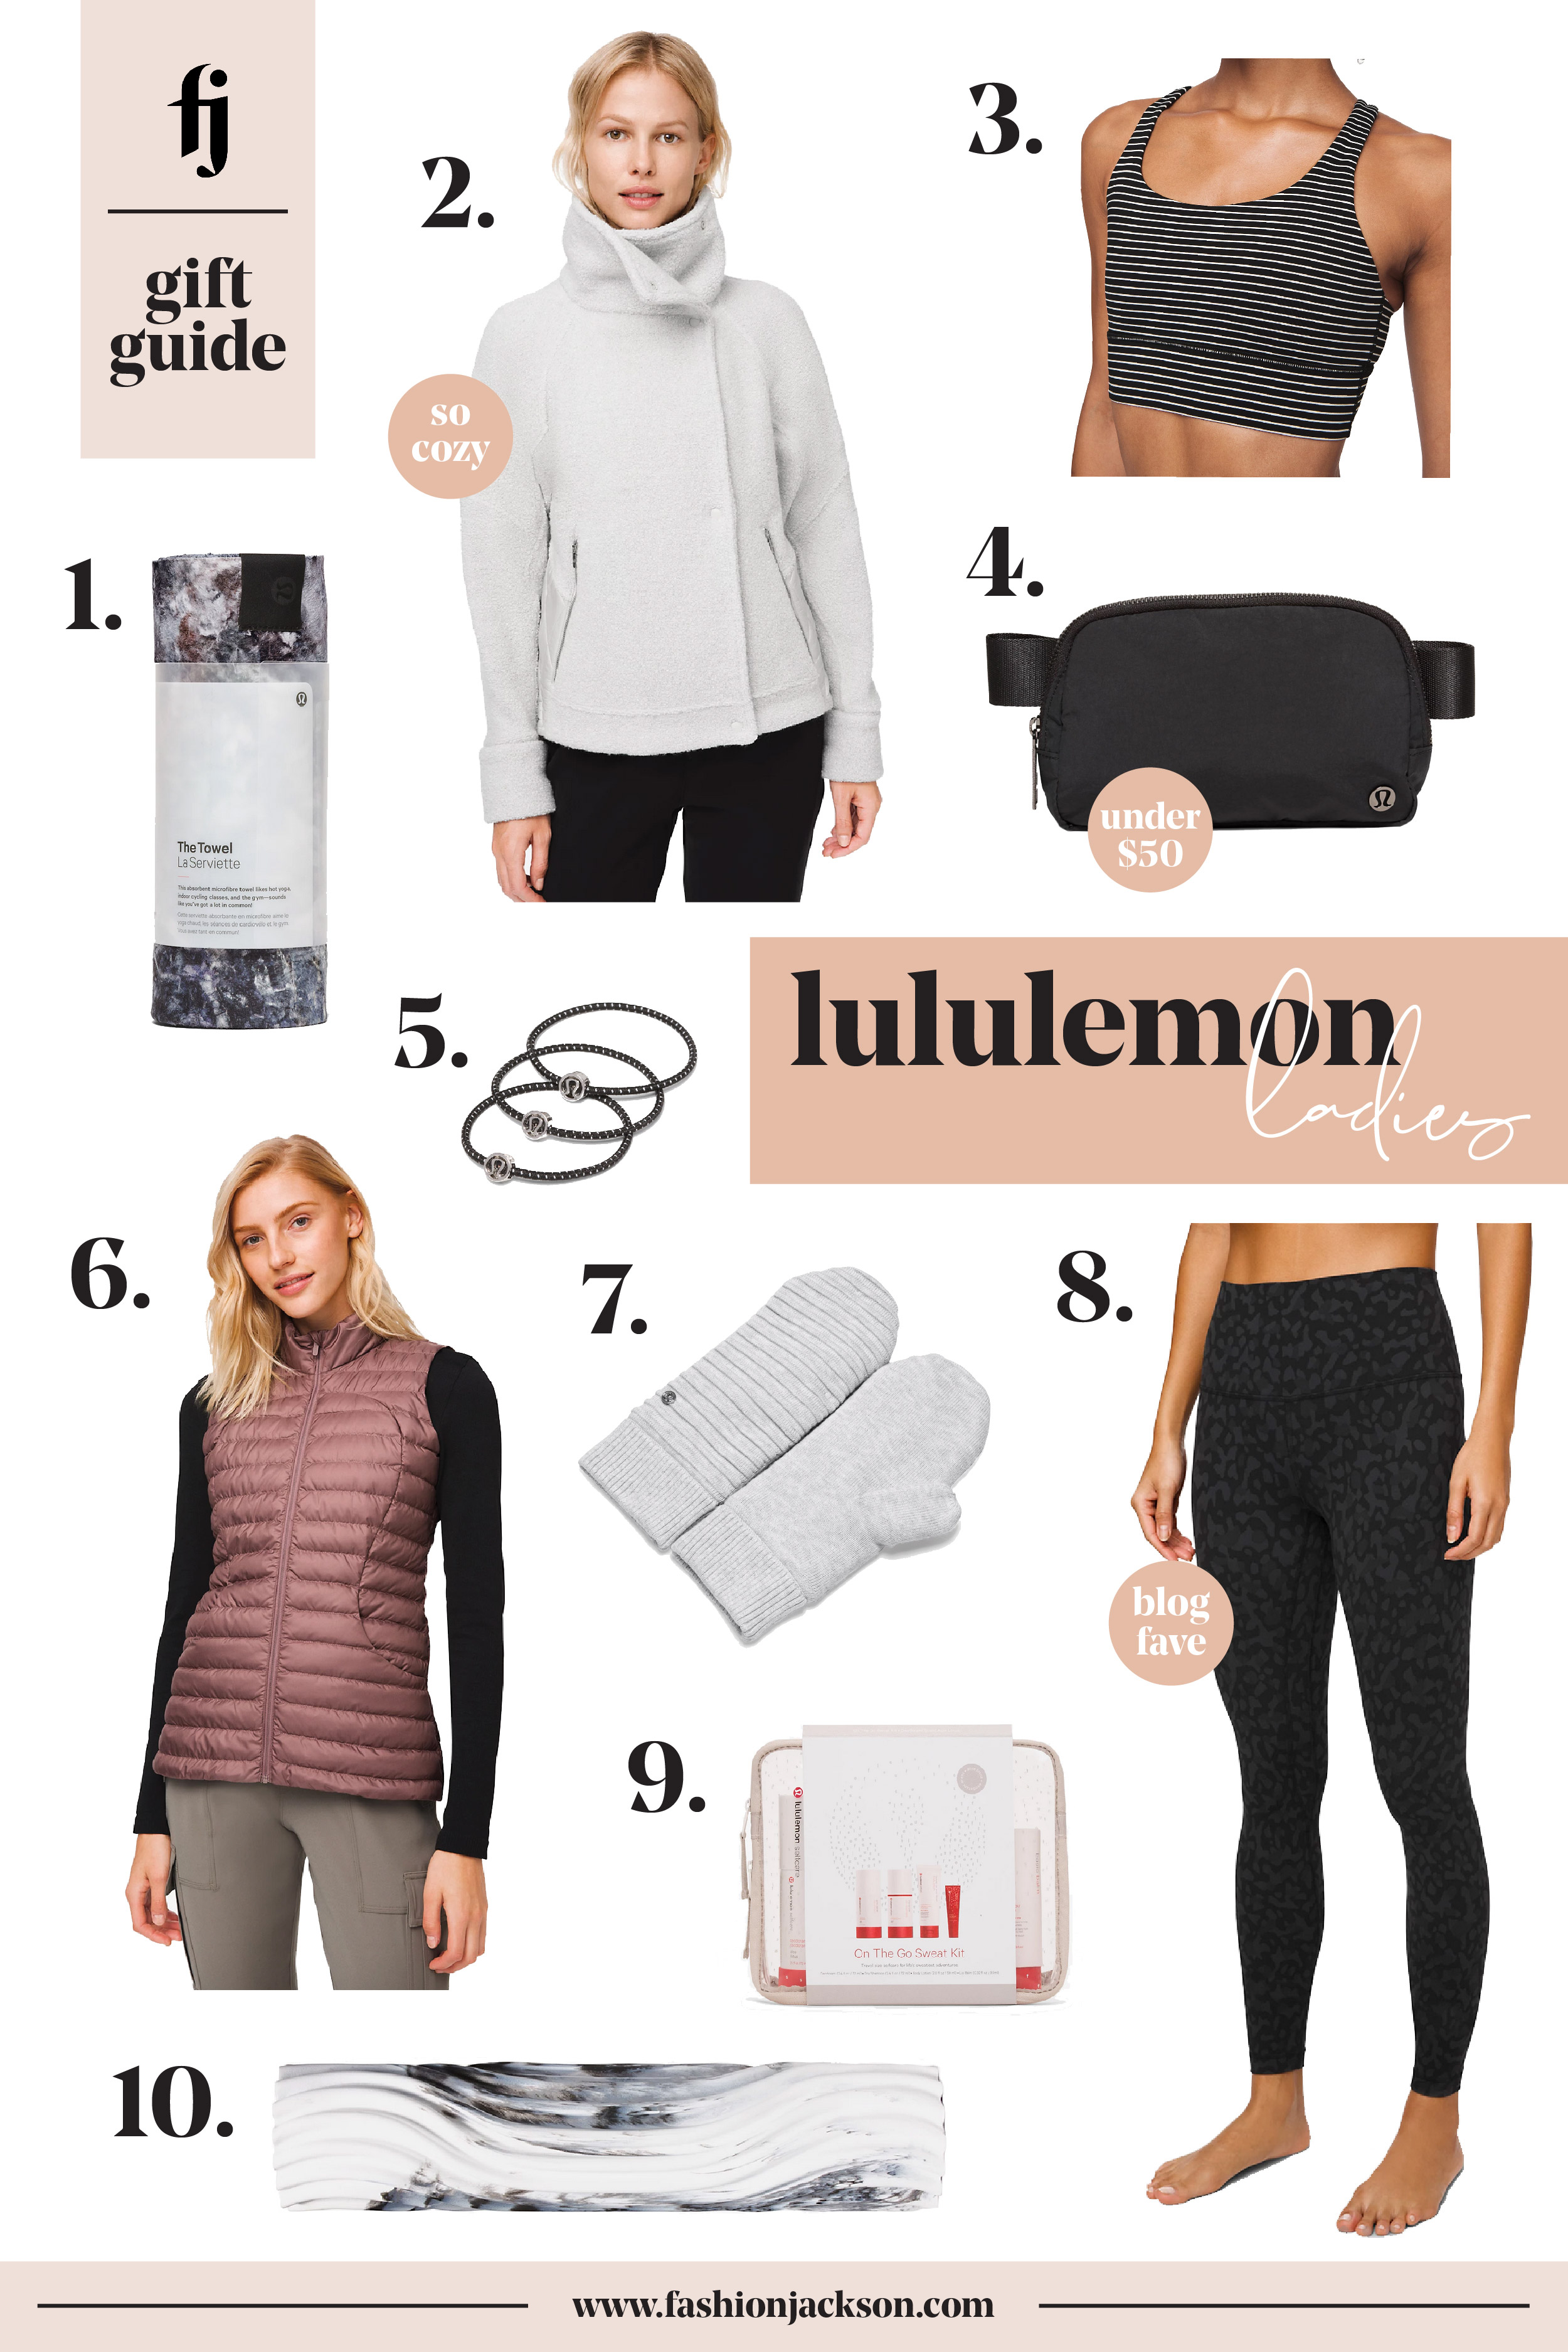 Fashion Jackson lululemon Womens Gift Guide